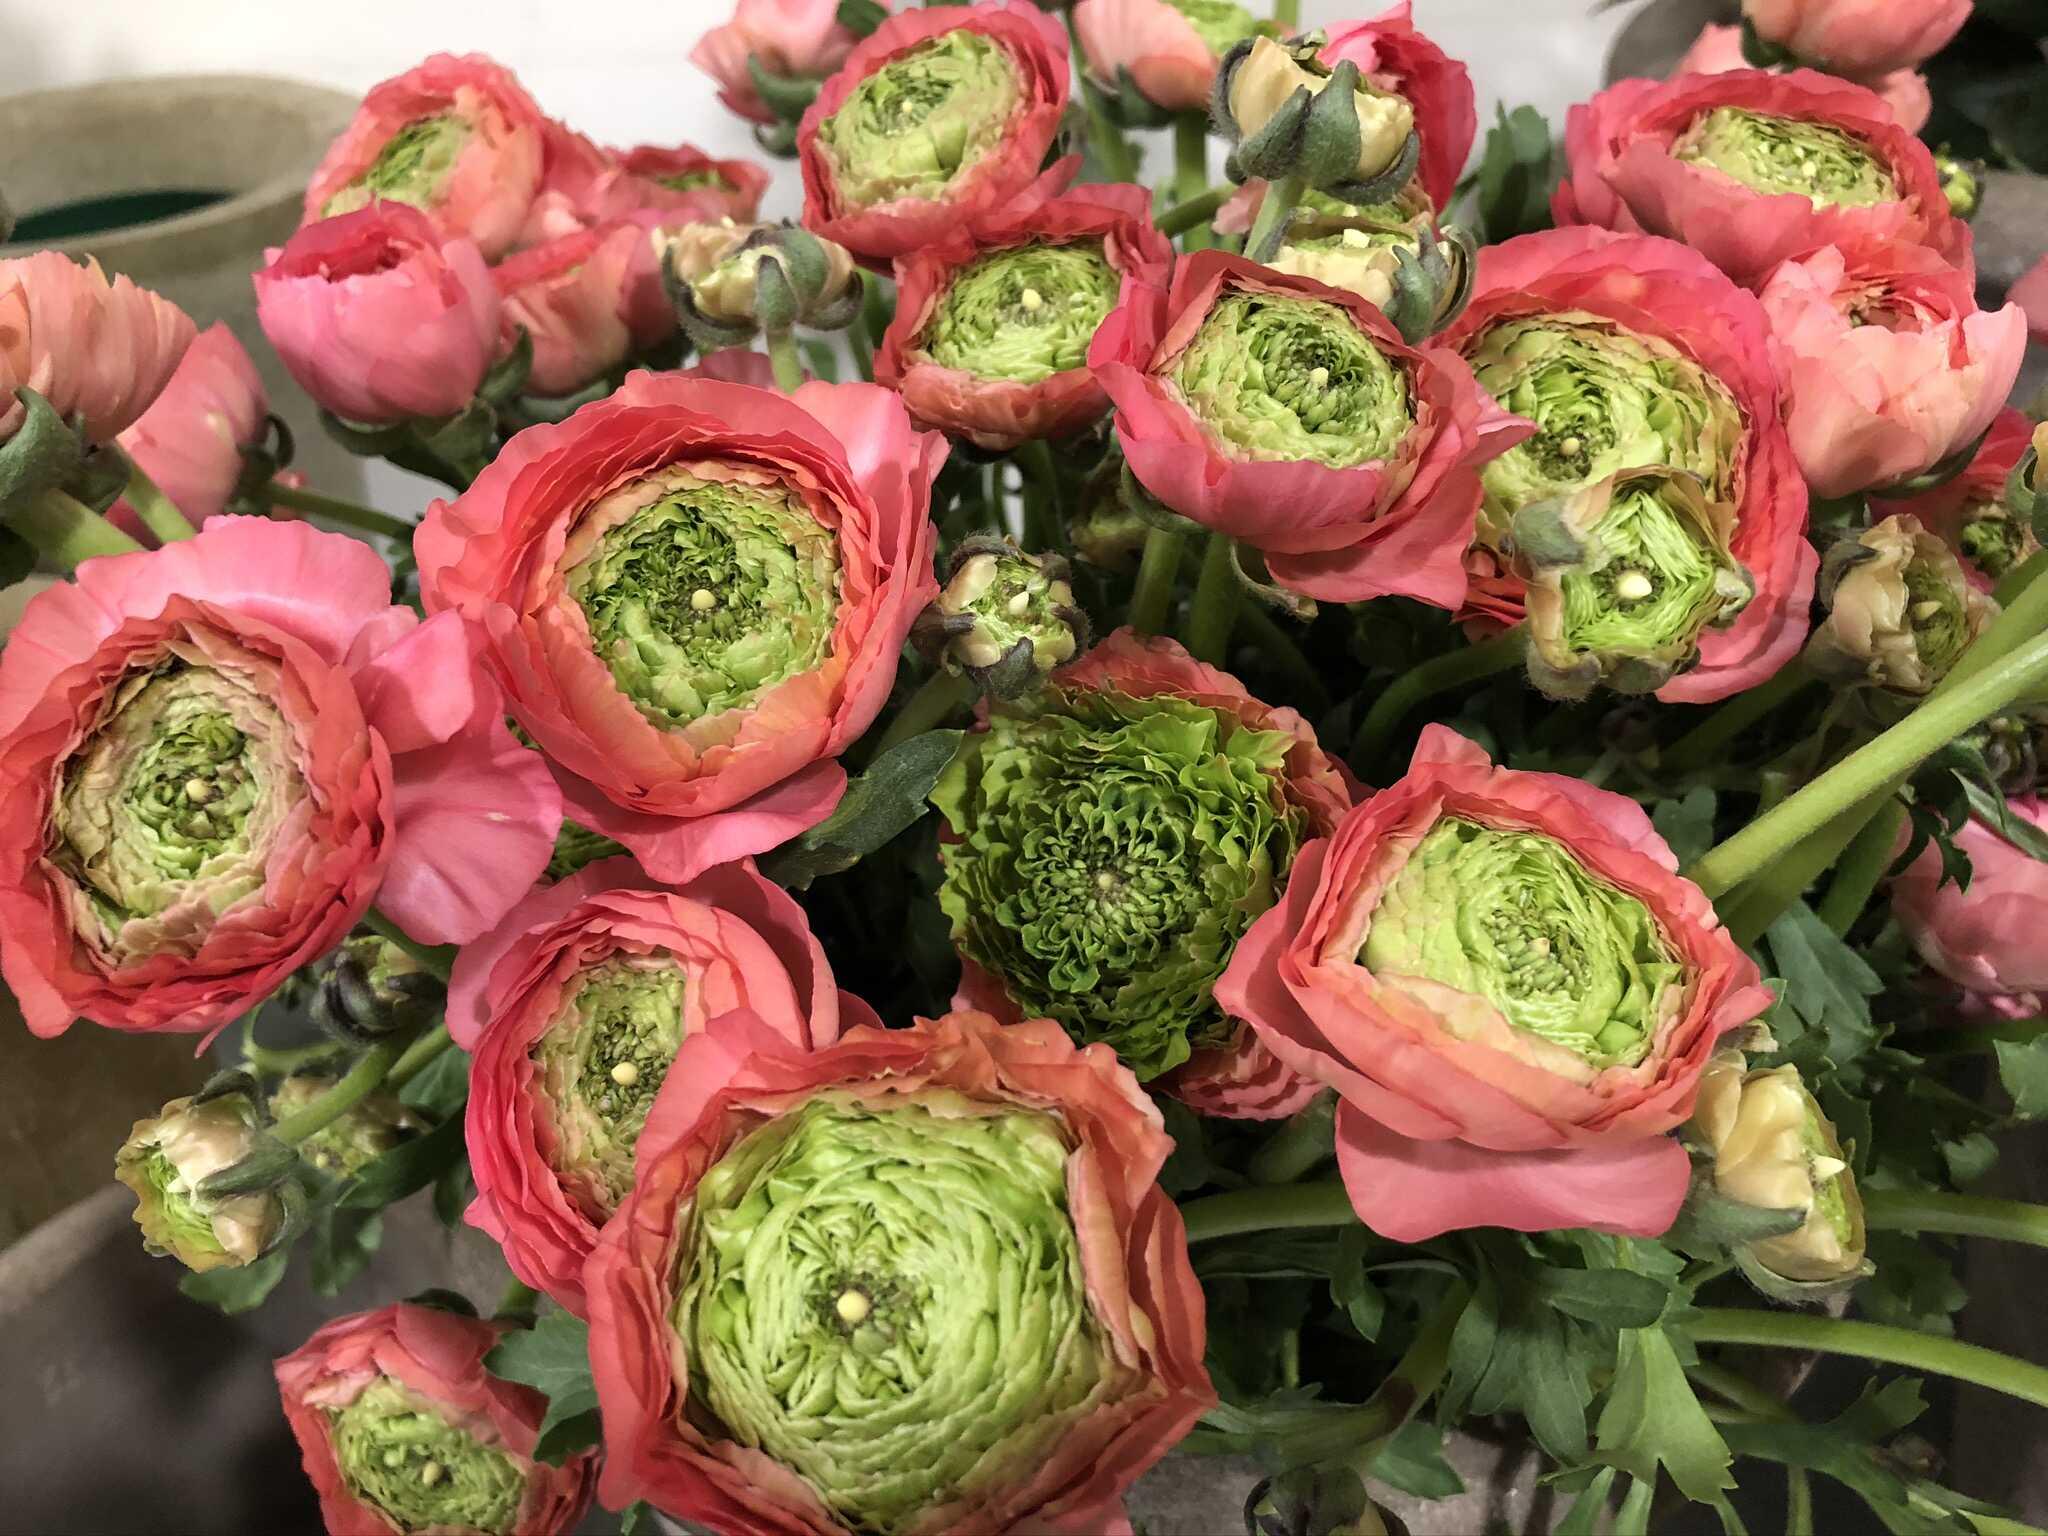 Table renoncules Marlies Fleurs fleurist